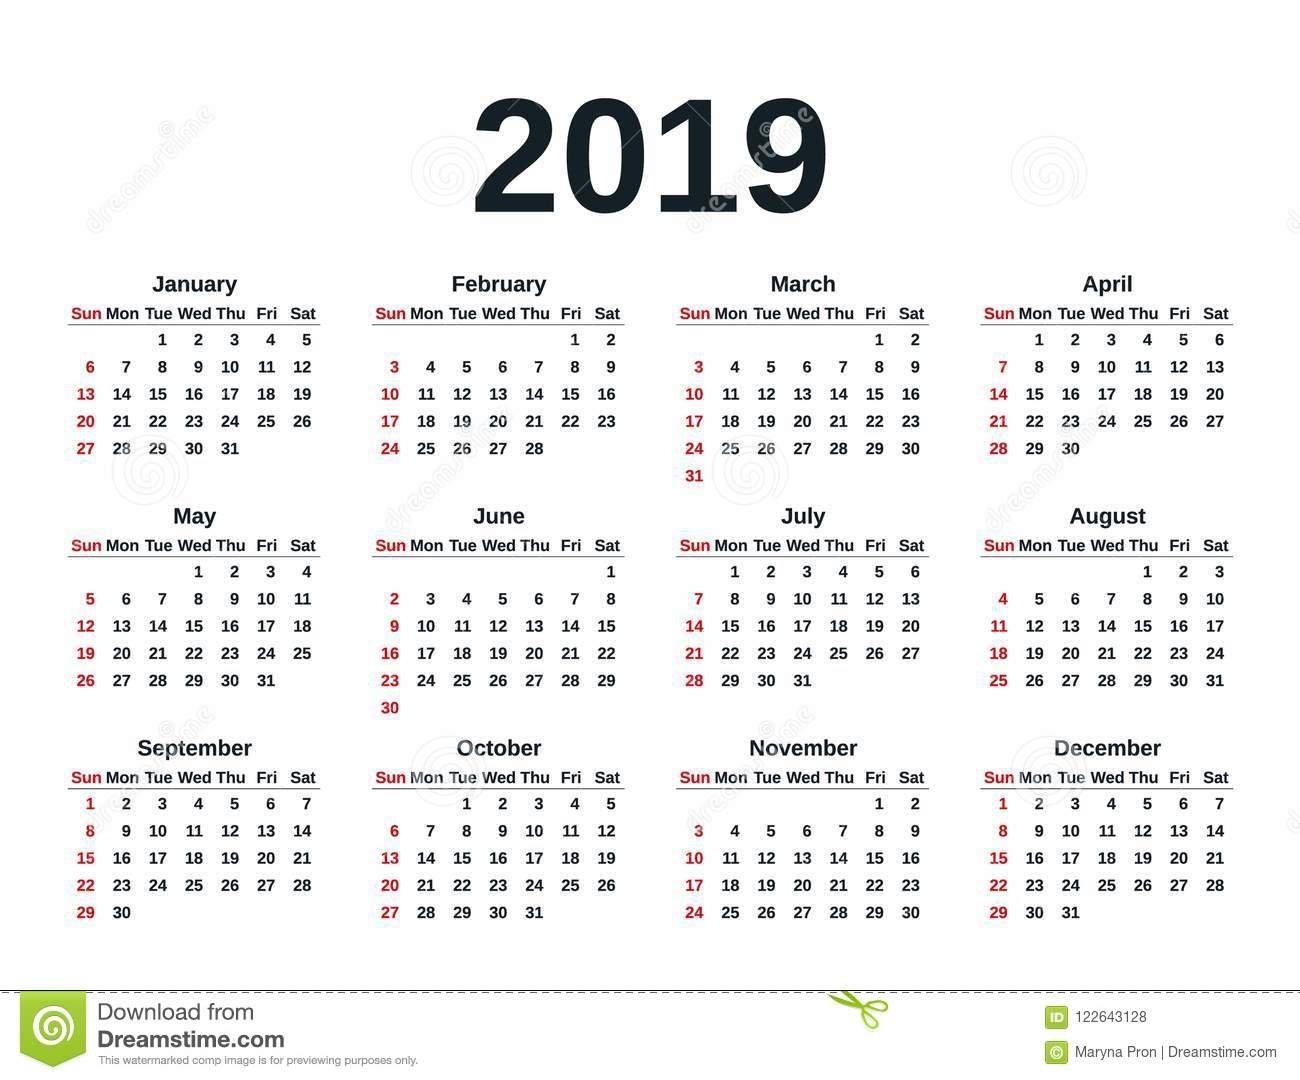 2019 Calendar Year. Vector Illustration. Template Planner. Stock Calendar Week 15 2019